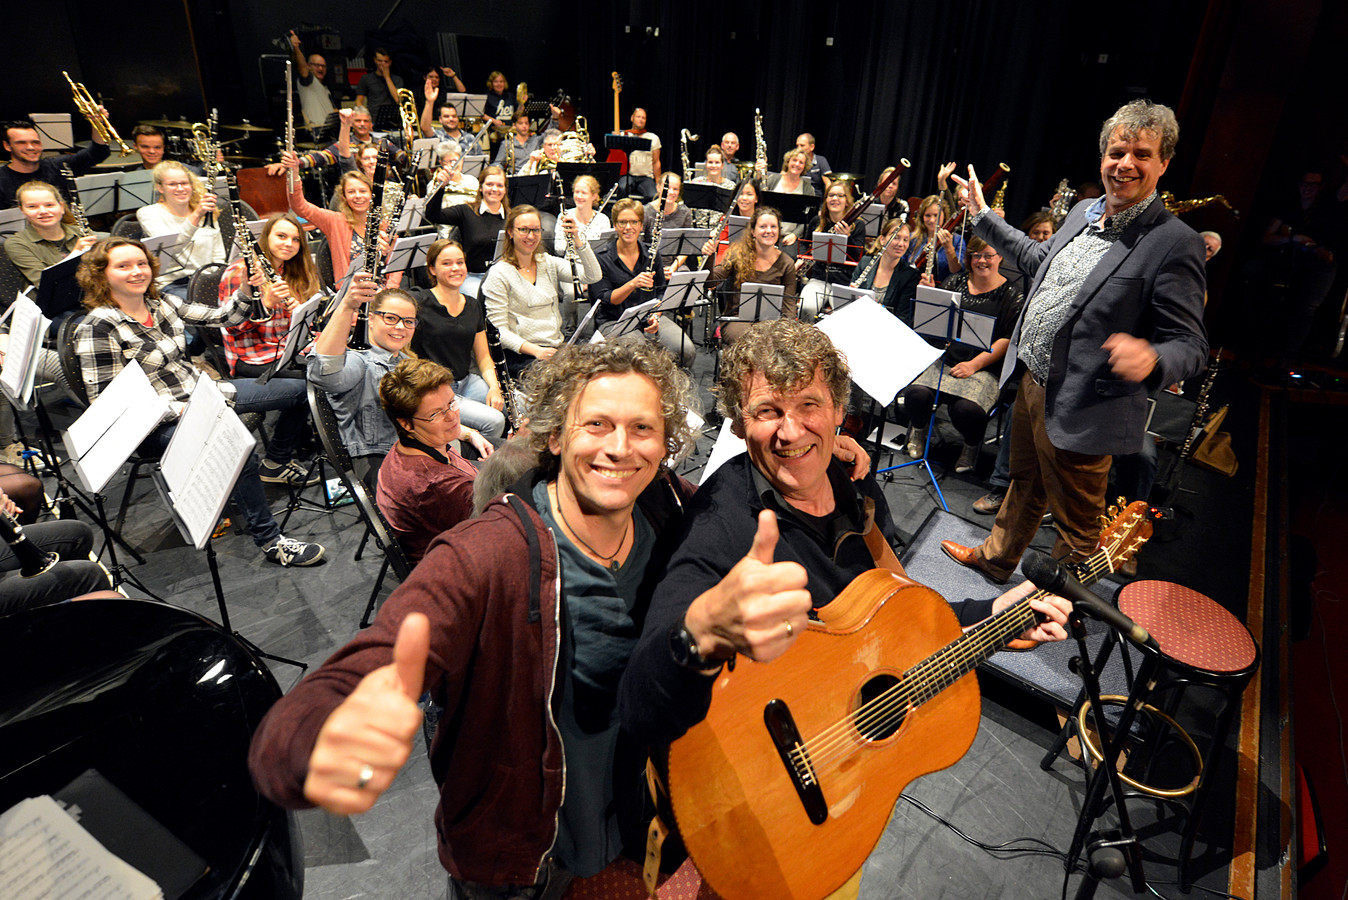 Twents Orkest Brengt Gé Reinders En Syb Van Der Ploeg Samen